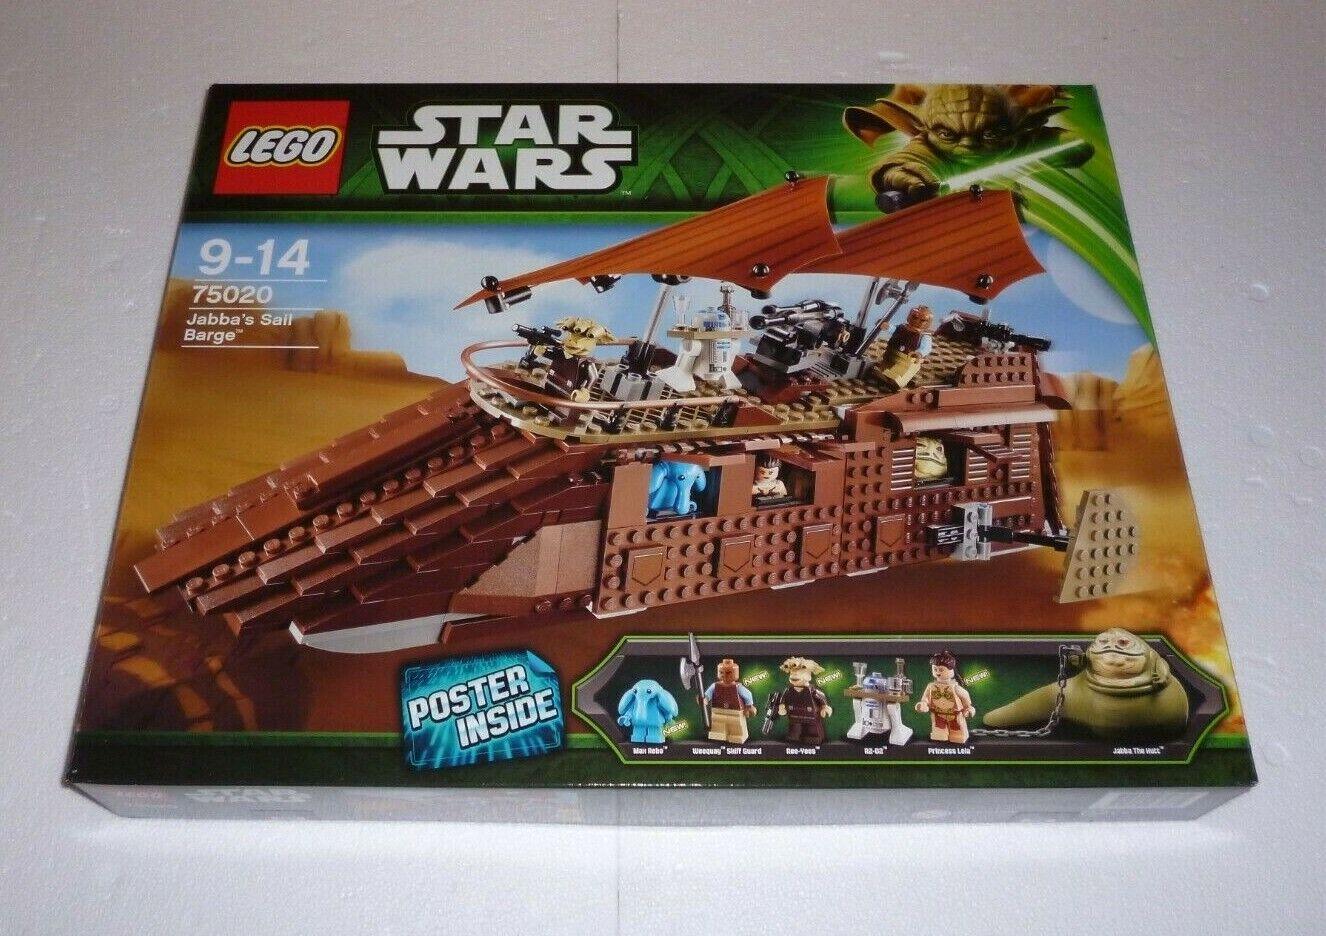 Lego Star Wars Jabba's Sail Barge (75020) nuevo New, embalaje original